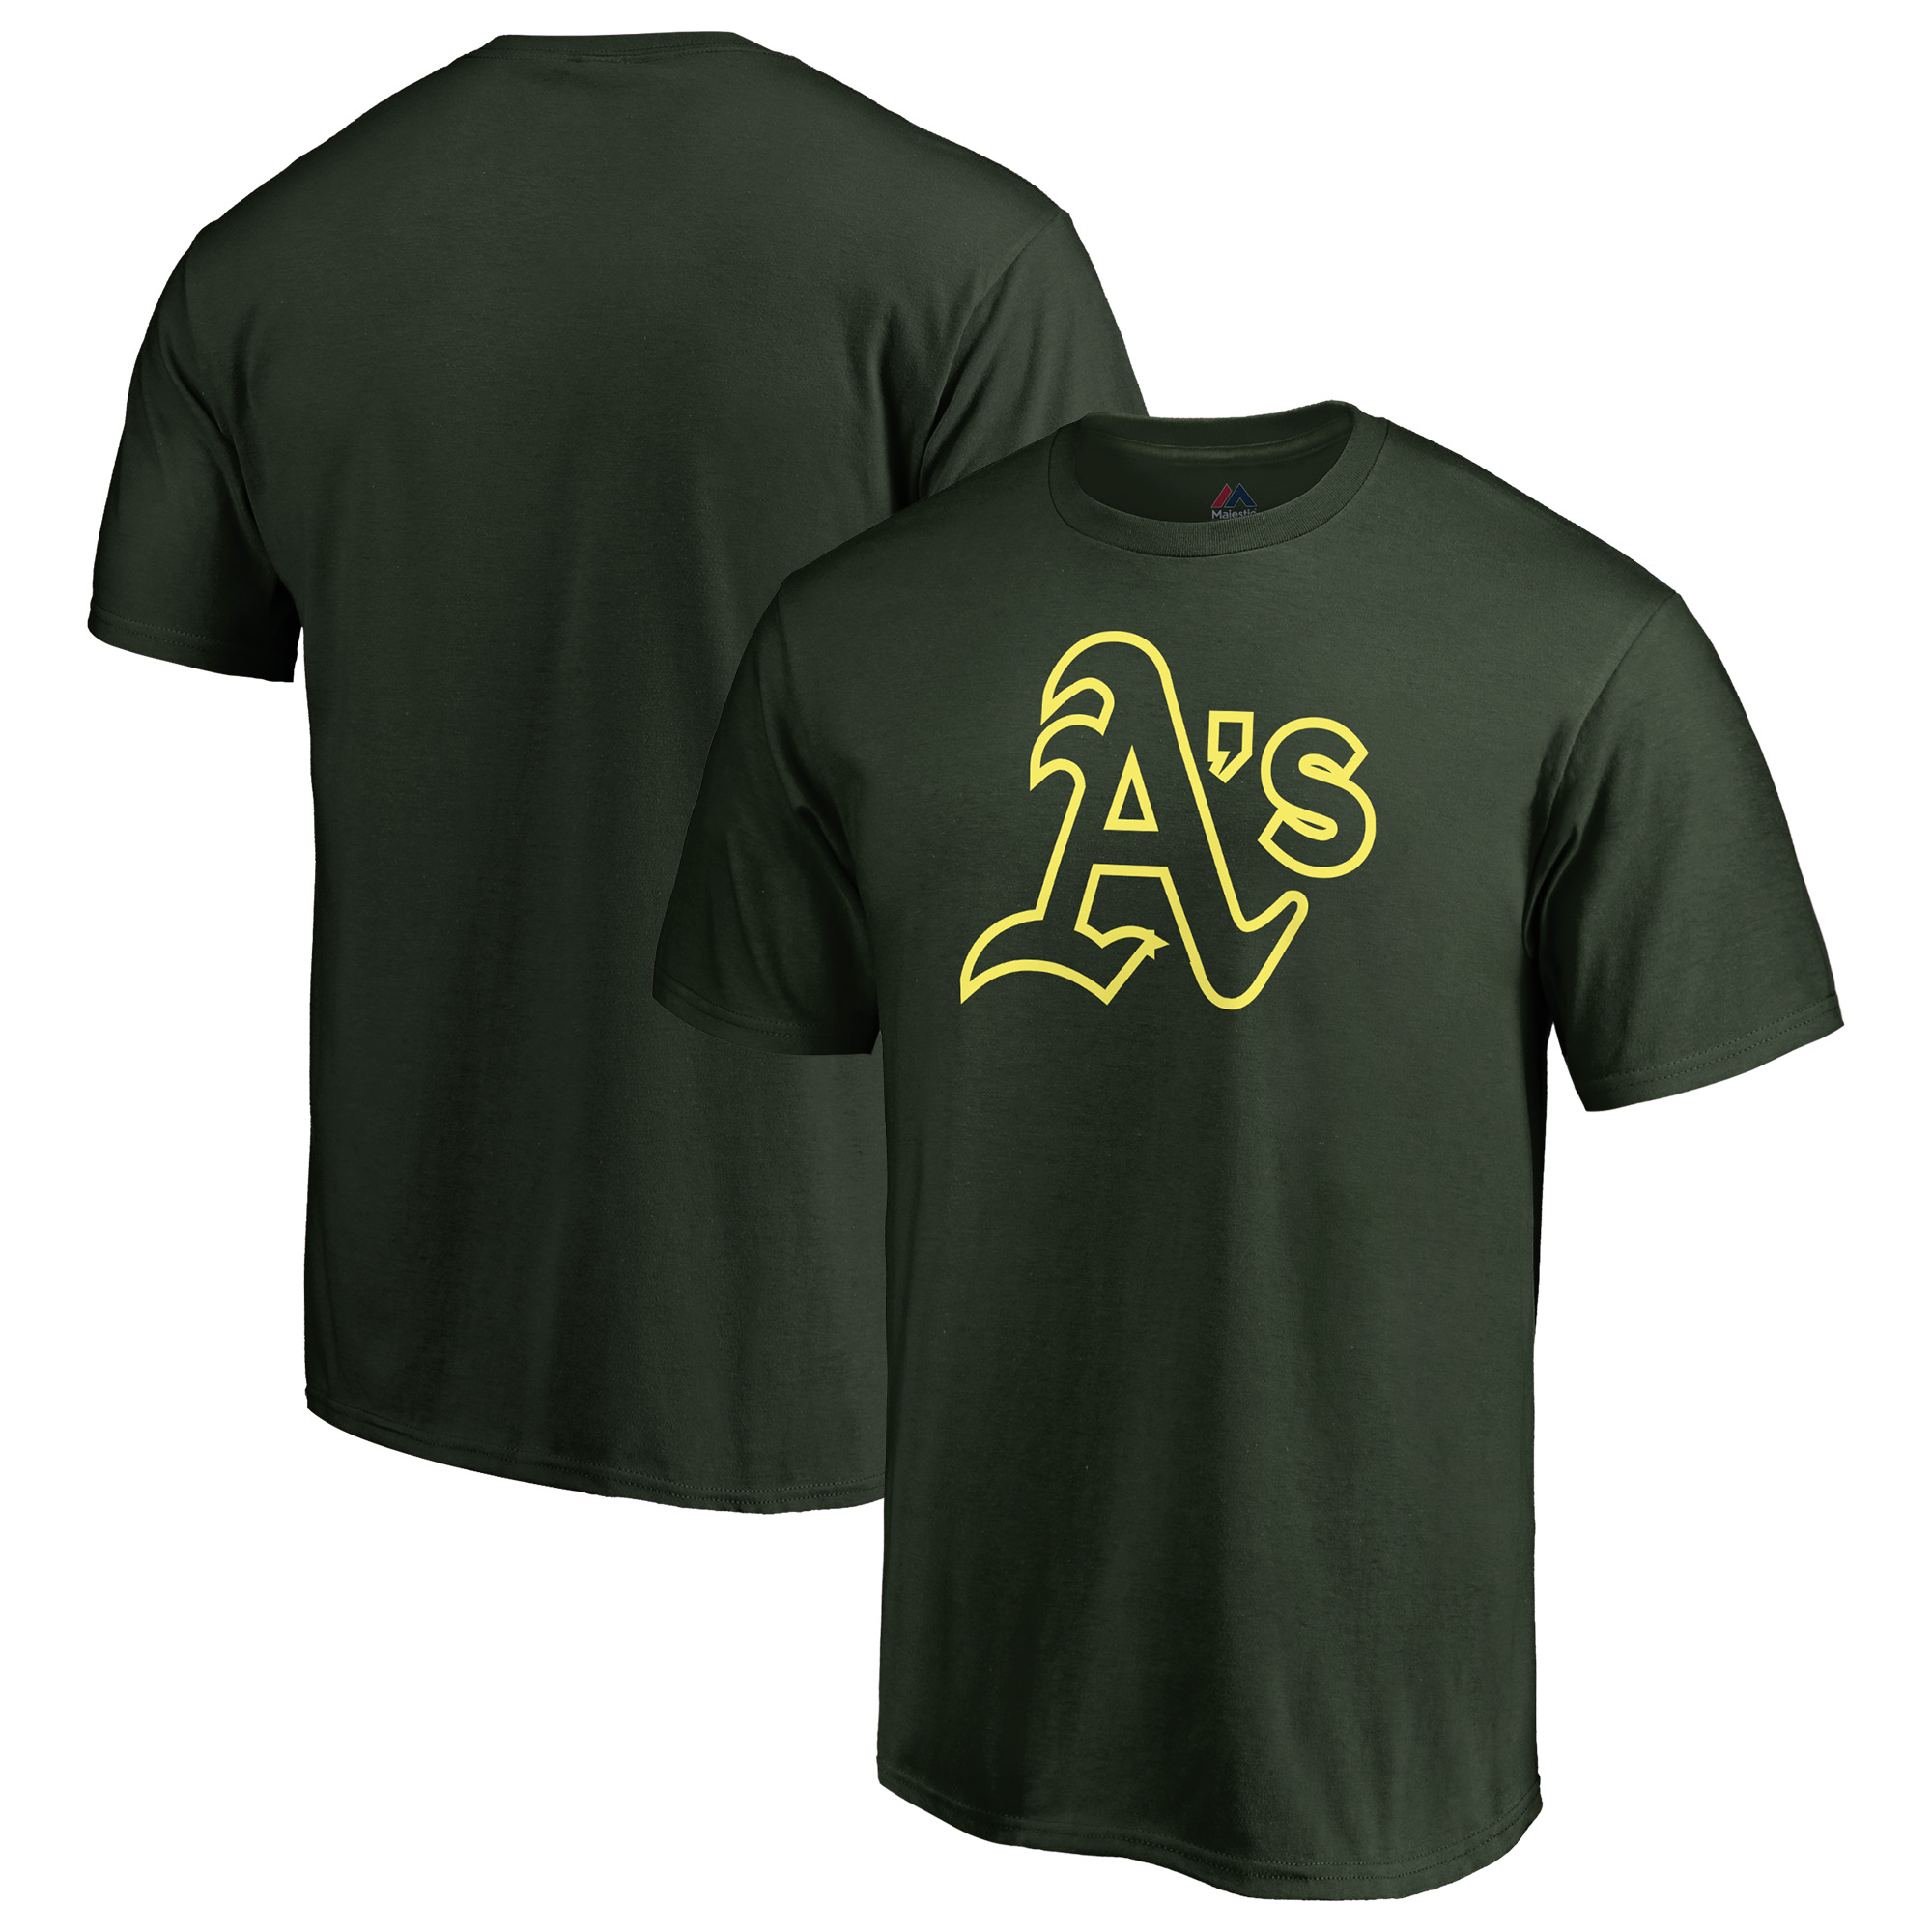 Oakland Athletics Majestic 2018 Players' Weekend T-Shirt - Green